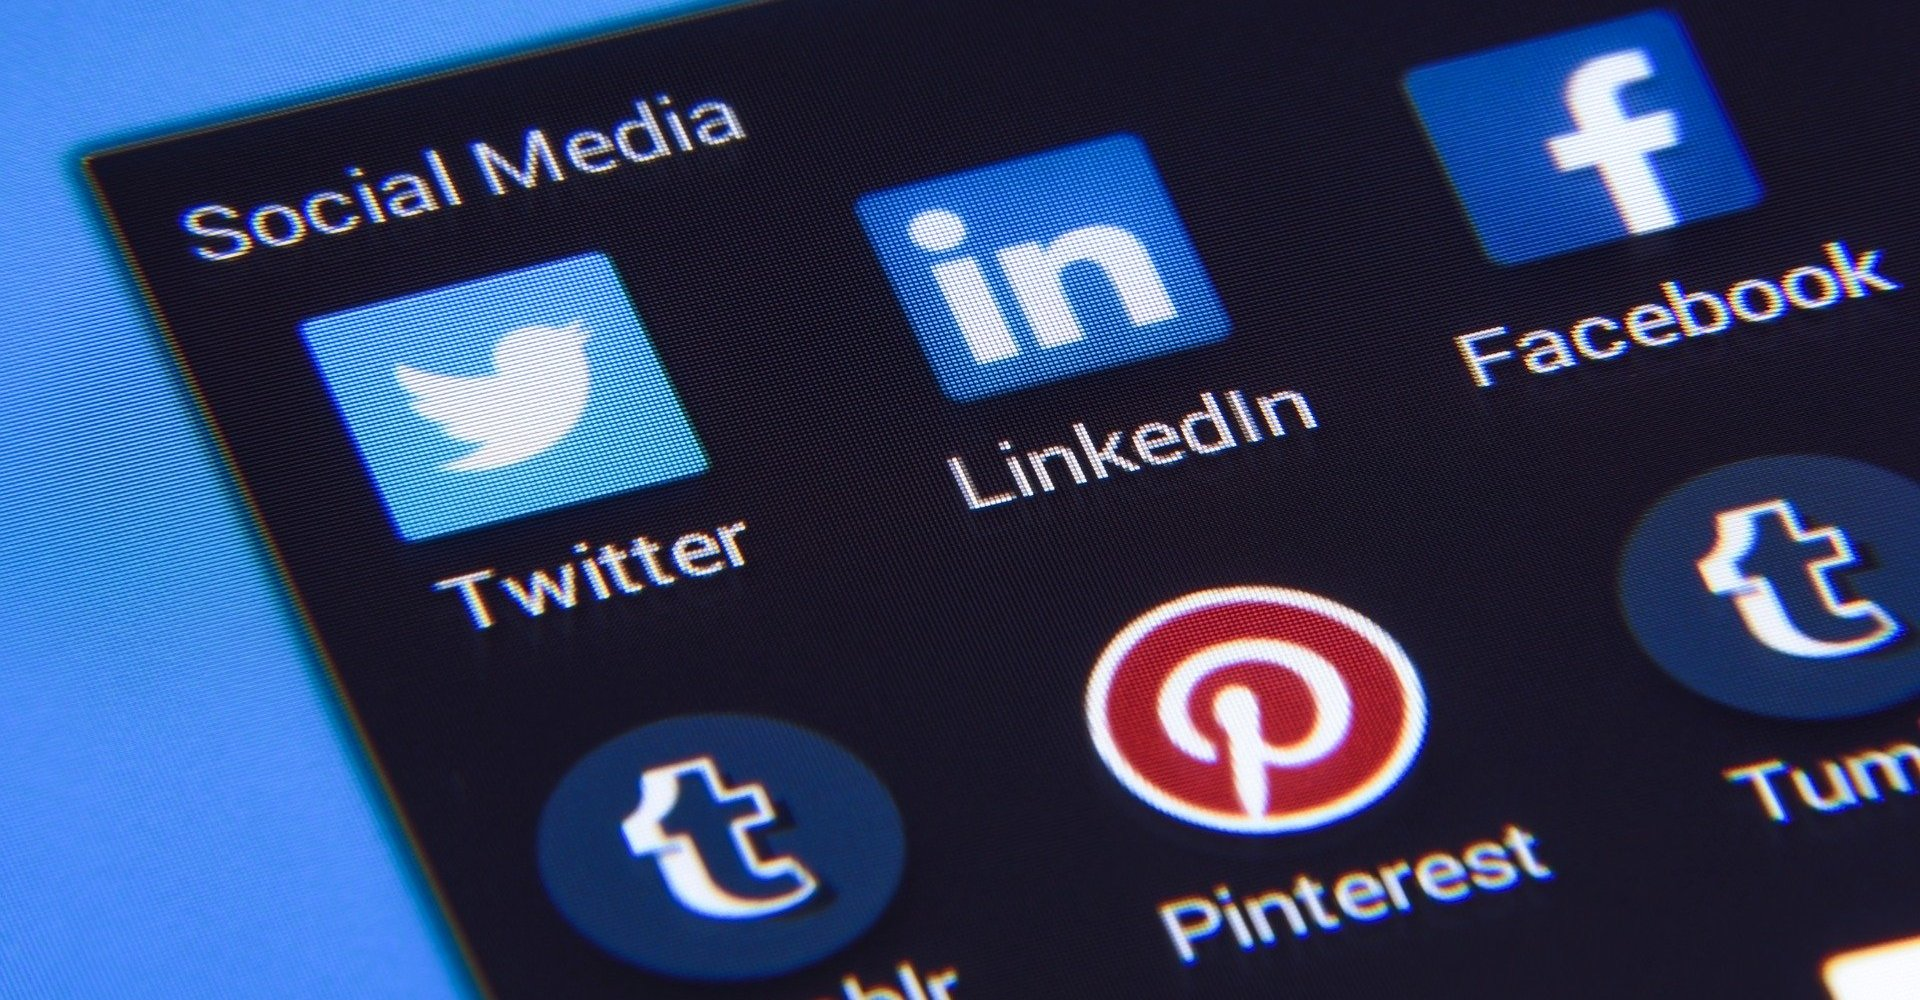 Ralli Ltd: Have You Been Injured? Beware of Social Media Banner